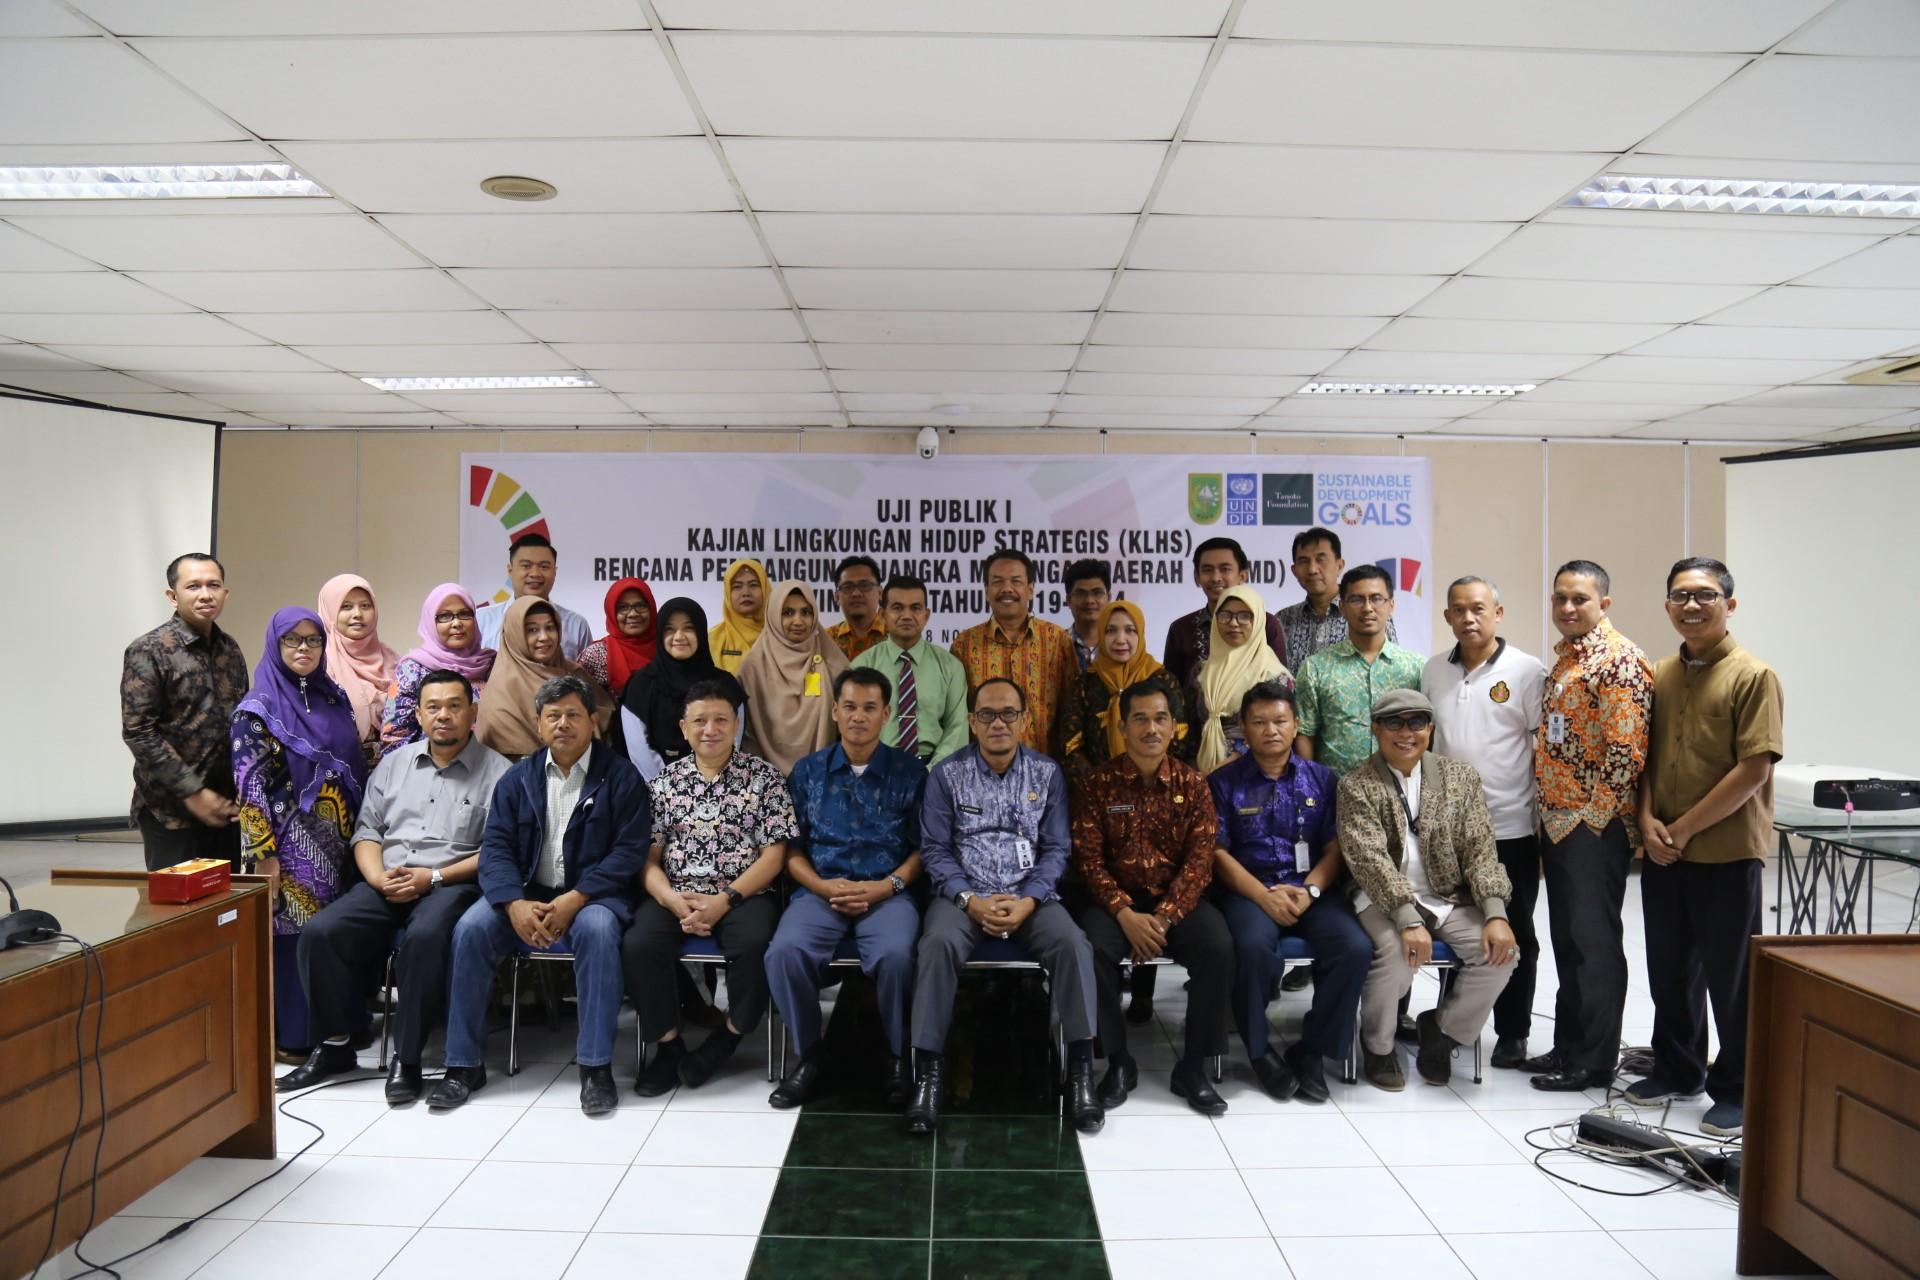 Uji Publik I Kajian Lingkungan Hidup Strategis (KLHS) RPJMD Provinsi Riau Tahun 2019-2024